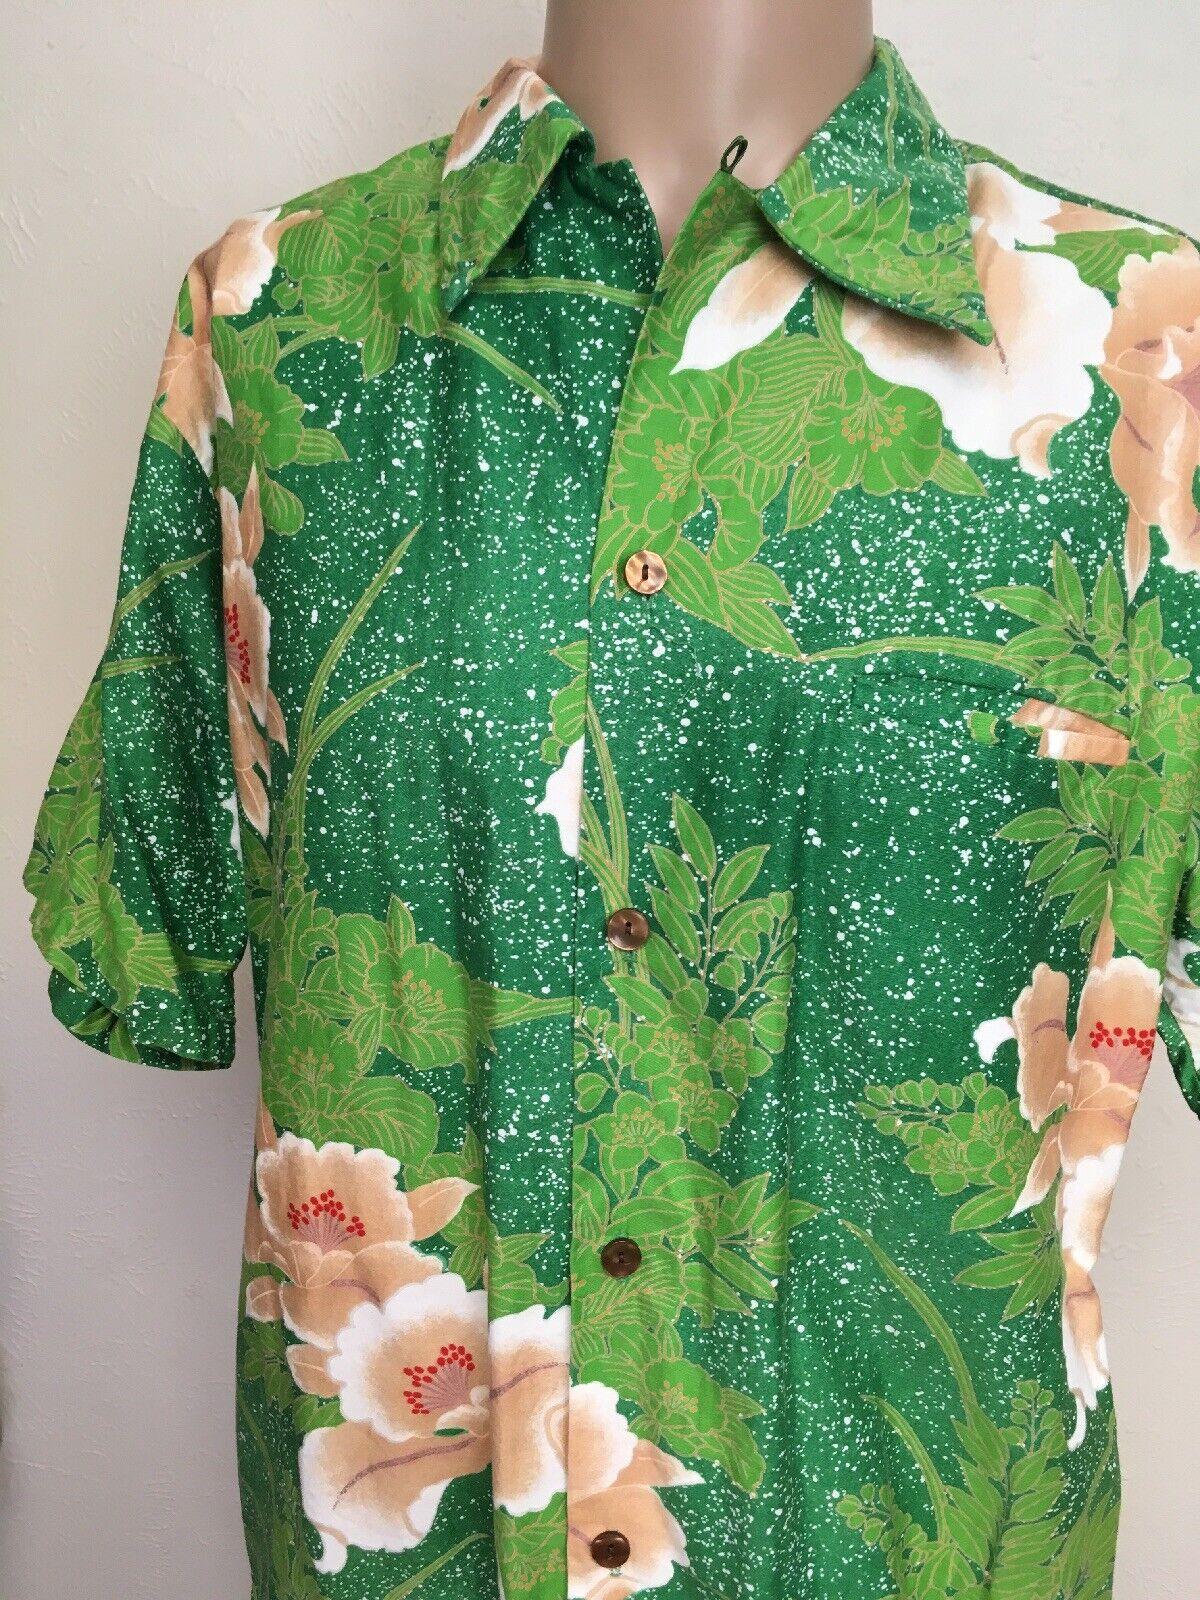 VTG 70s HIS ROYAL HIGHNESS HAWAIIAN SHIRT Green Splatter Floral LOOP COLLAR L